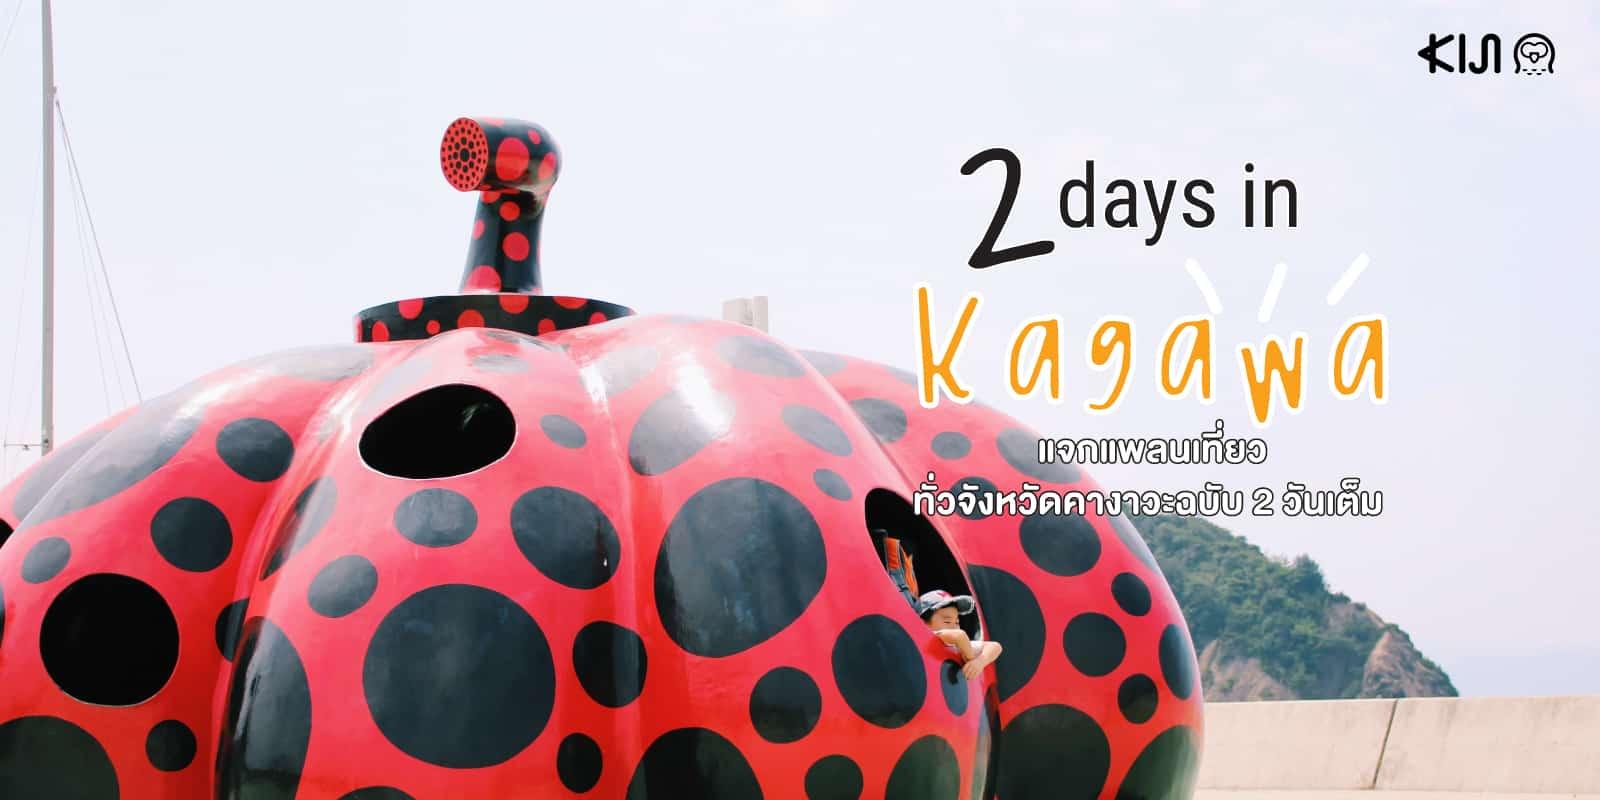 Kagawa แพลนเที่ยวจังหวัดคางาวะ 2 วัน